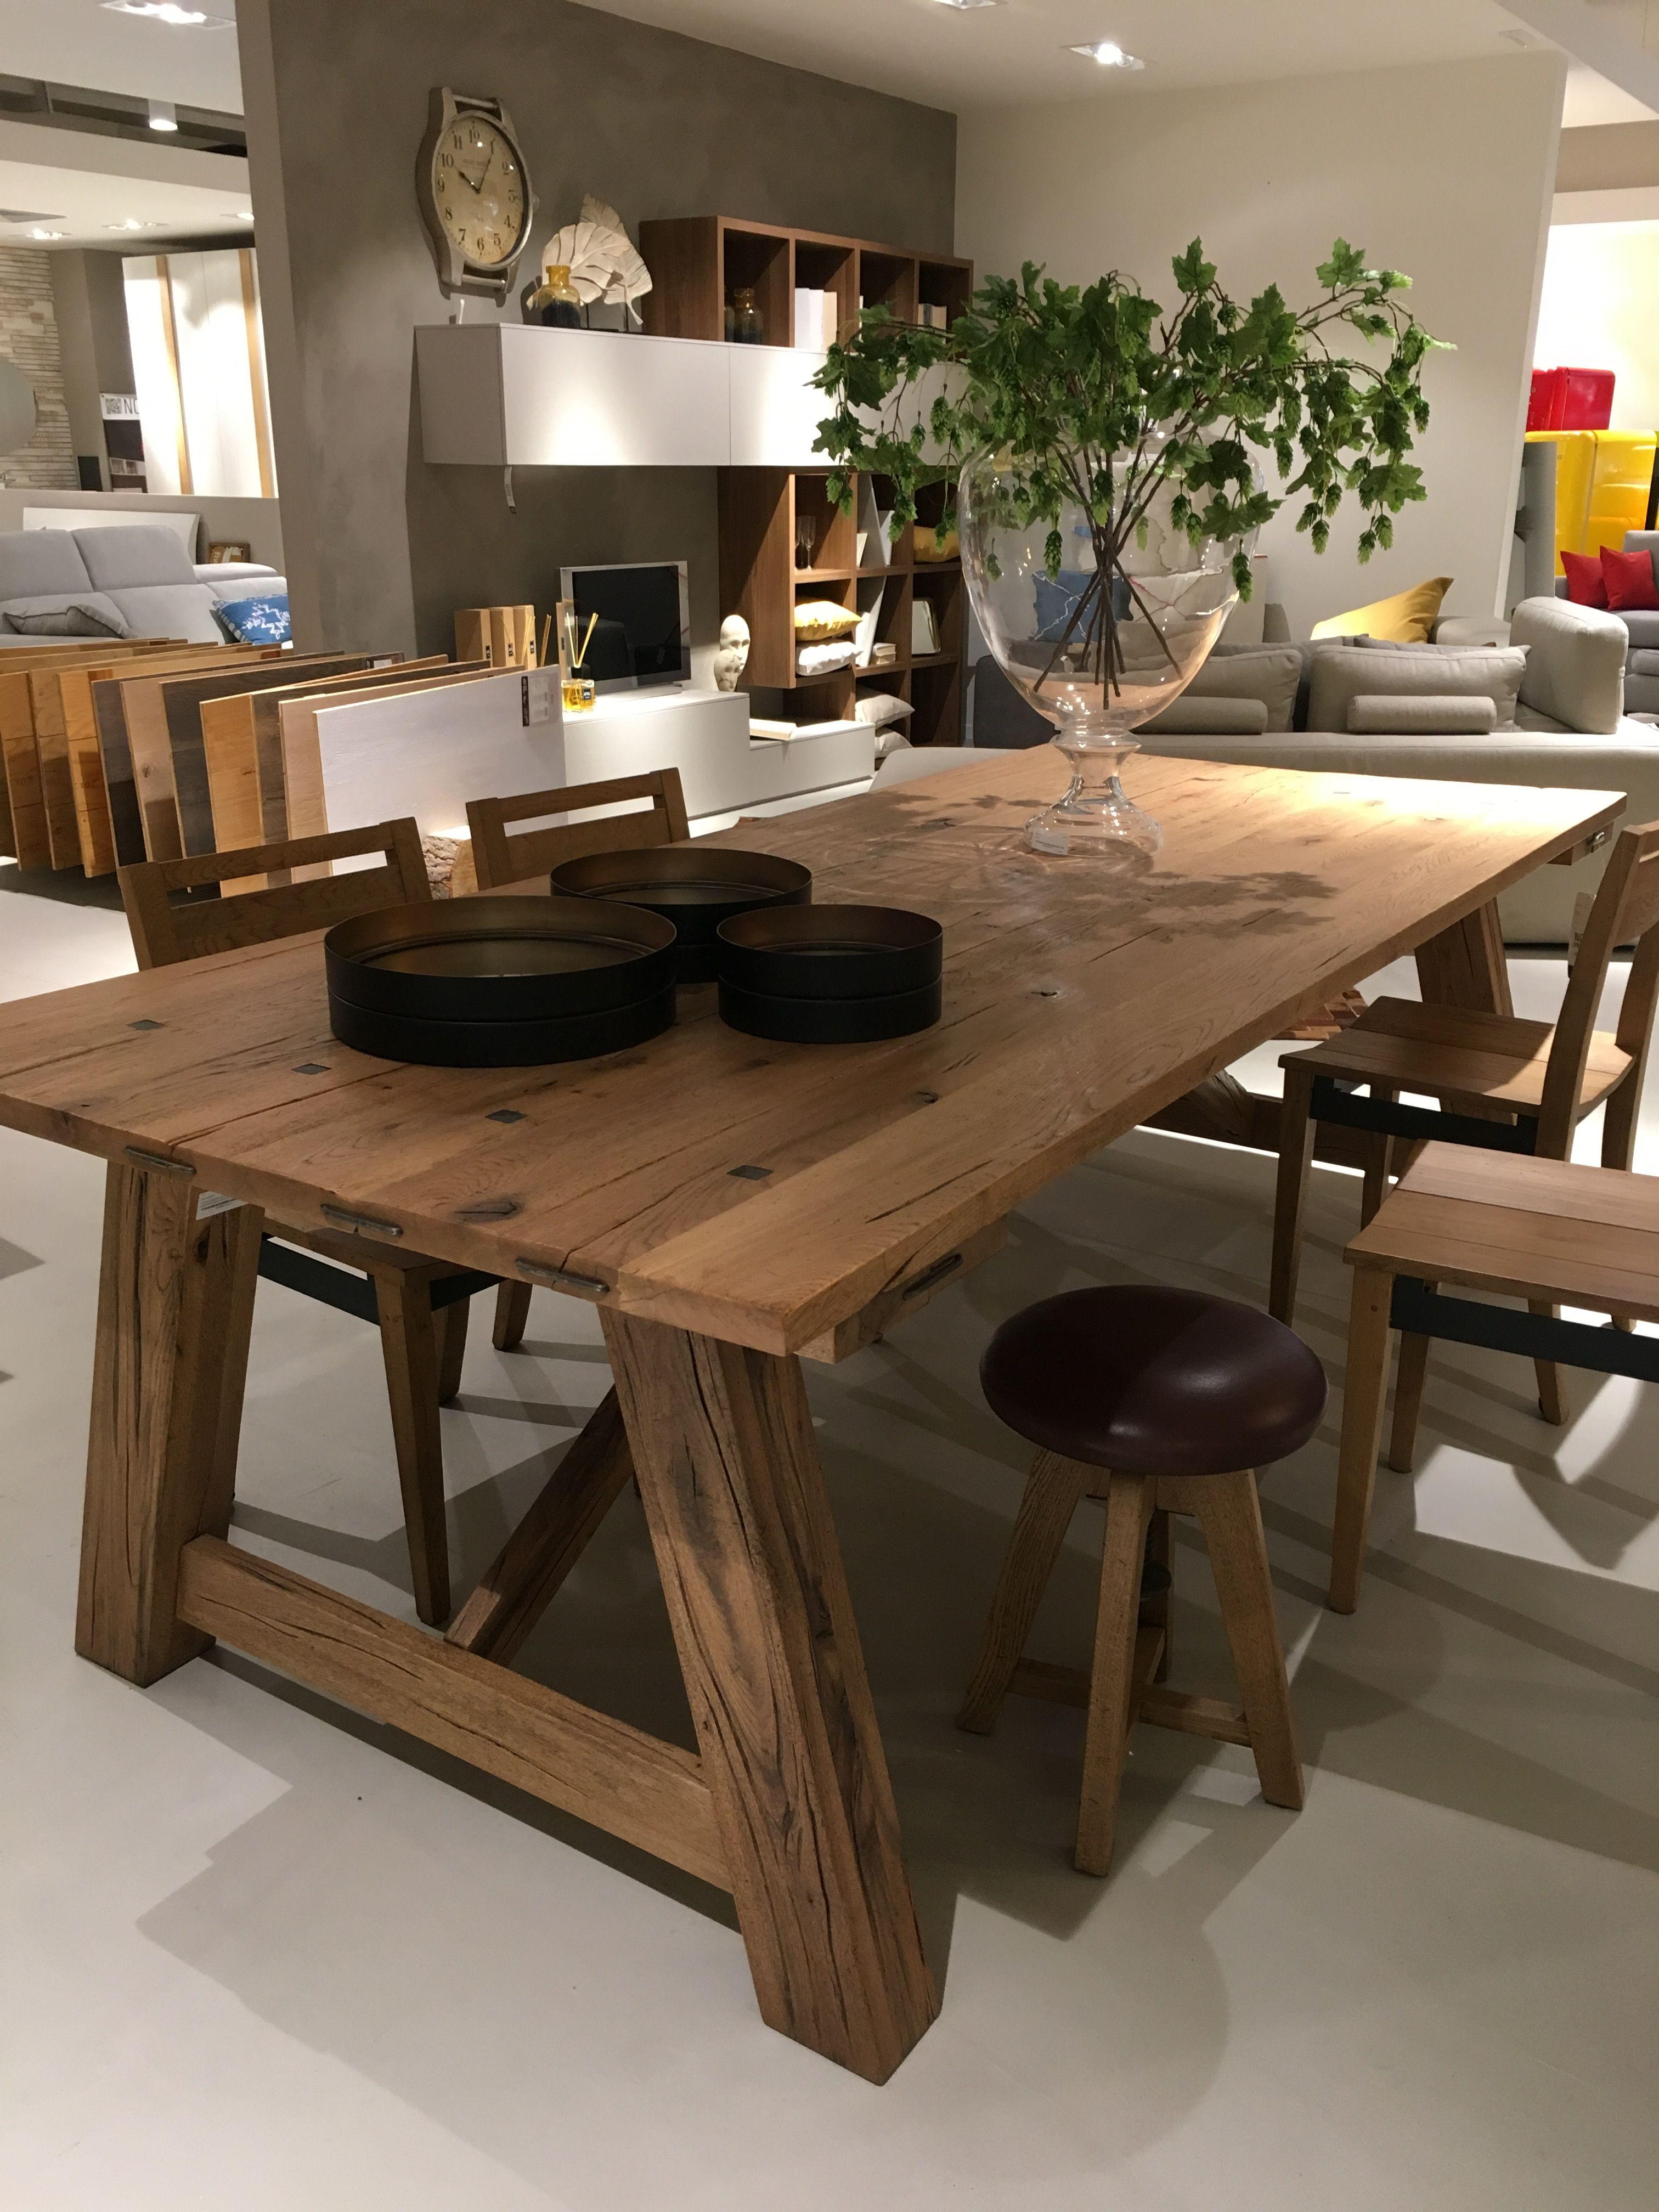 Centro veneto del mobile | Living rooms 2 | Pinterest | Garden table ...